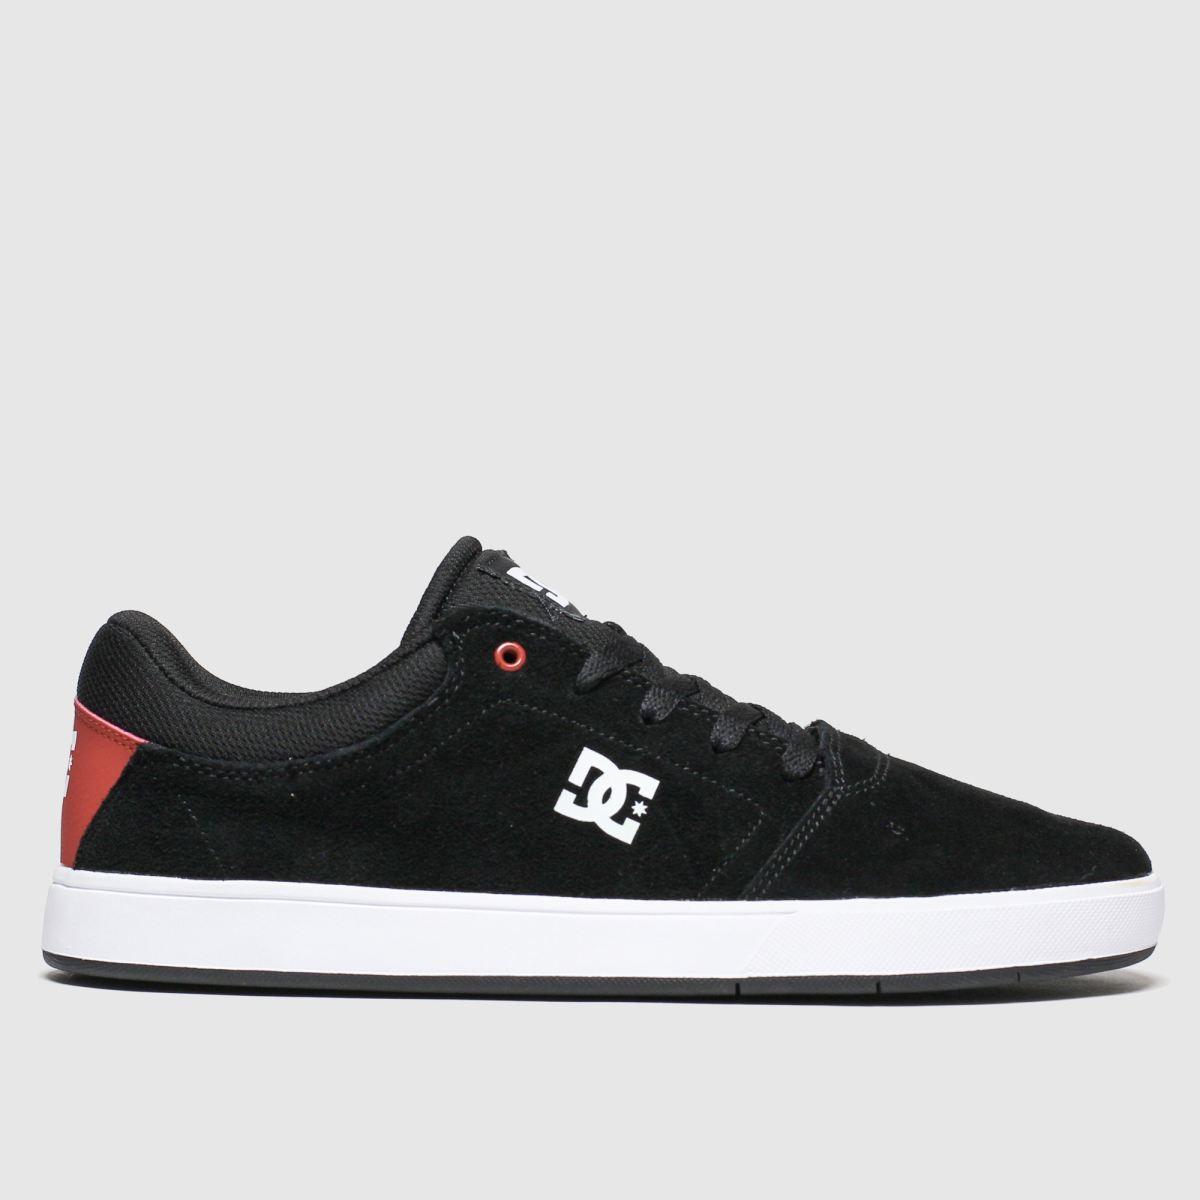 dc shoes Dc Shoes Black & Red Crisis Trainers